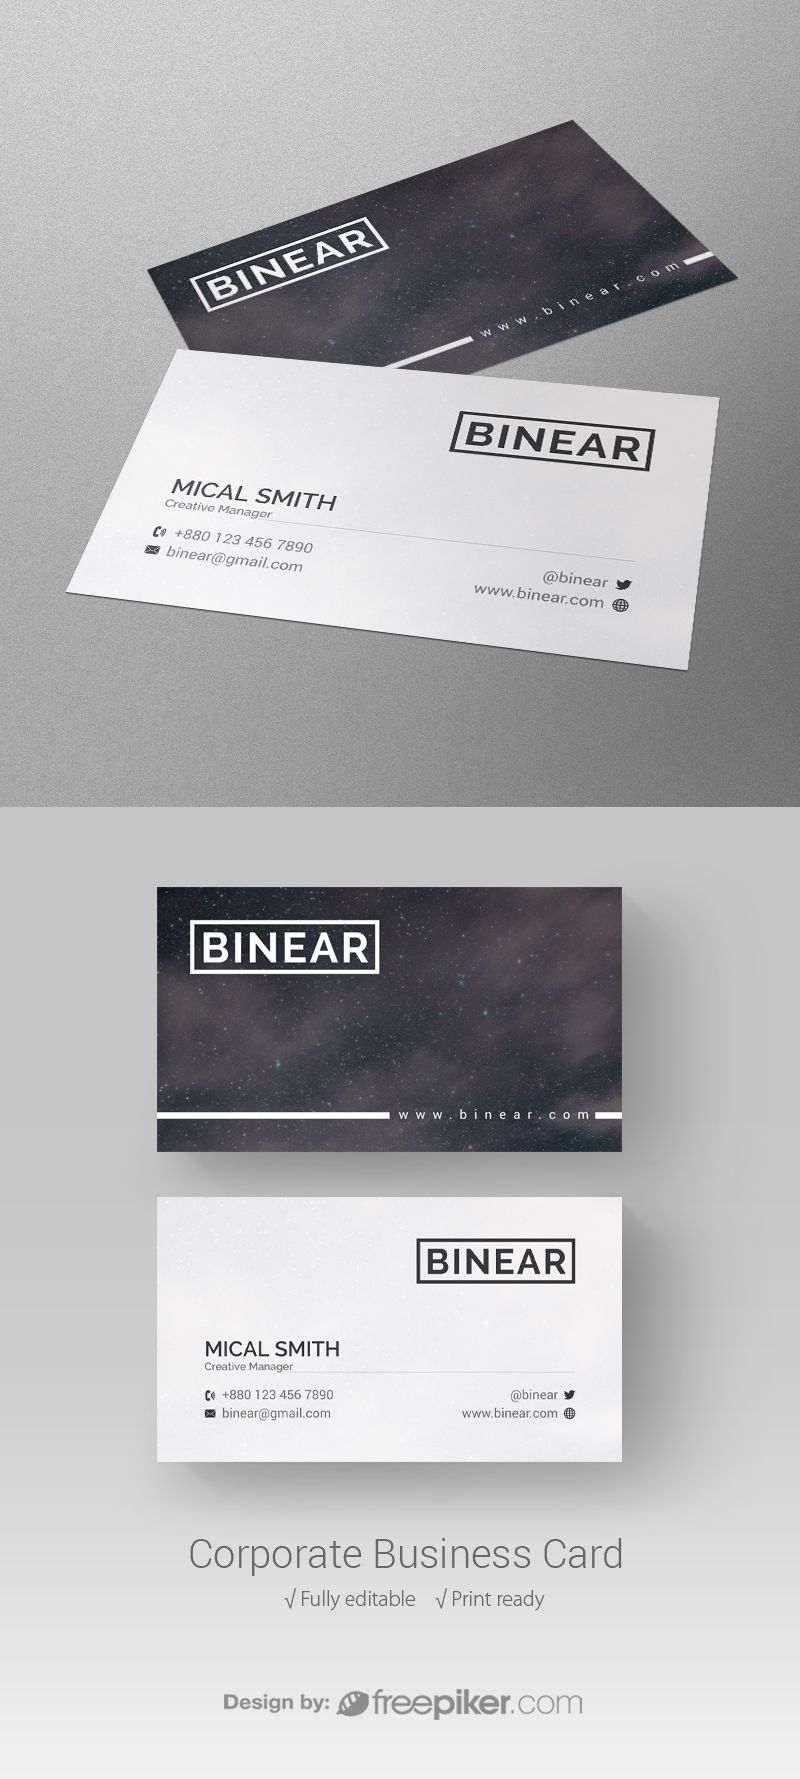 Corporate Business Card Corporate Business Card Business Cards Event Poster Design